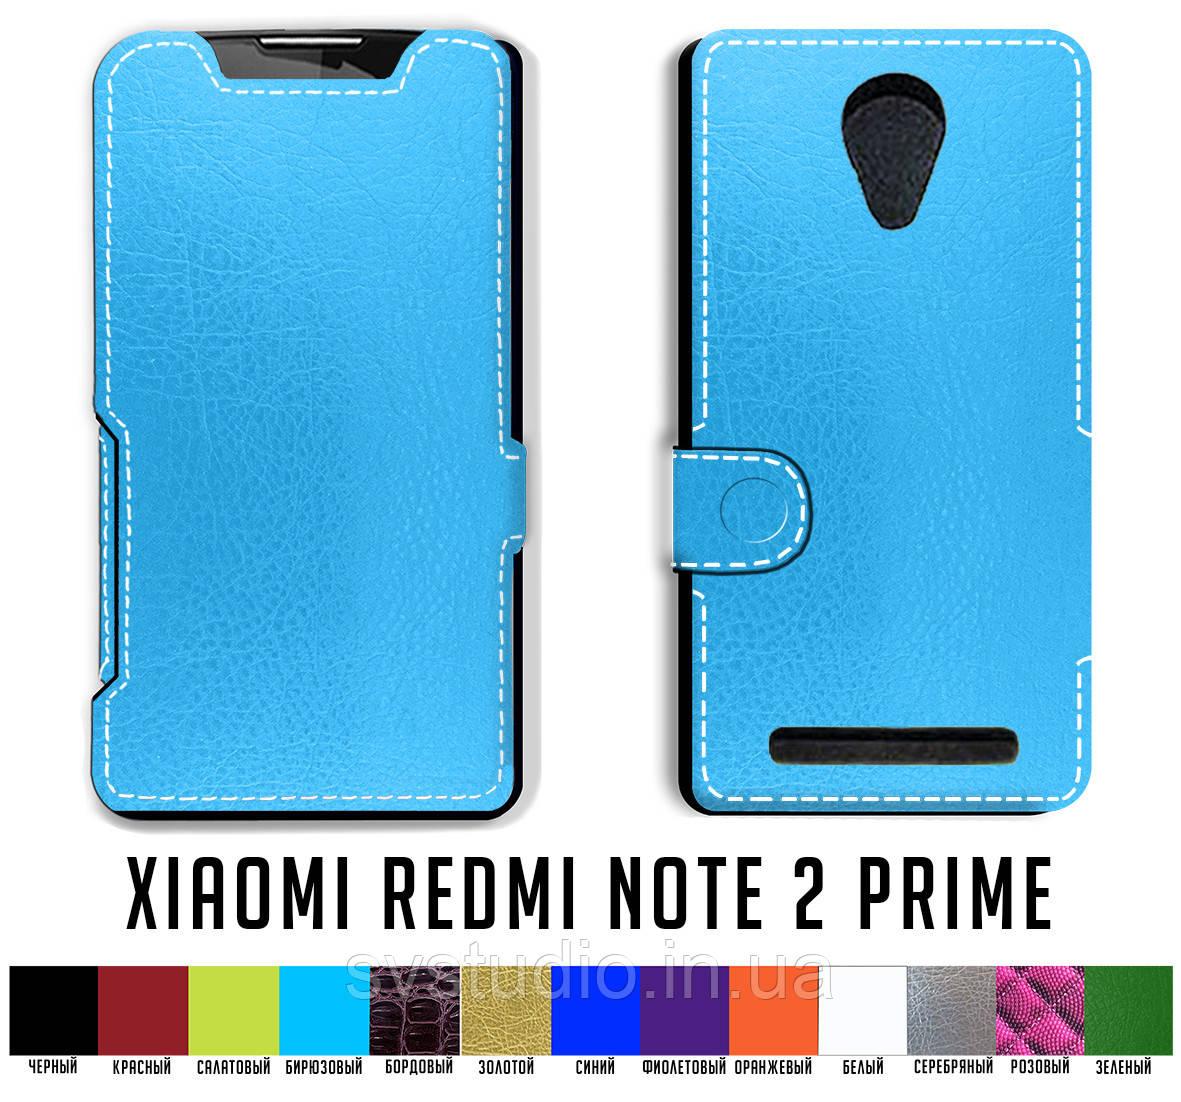 Xiaomi Redmi Note 2 Prime 165 With Style